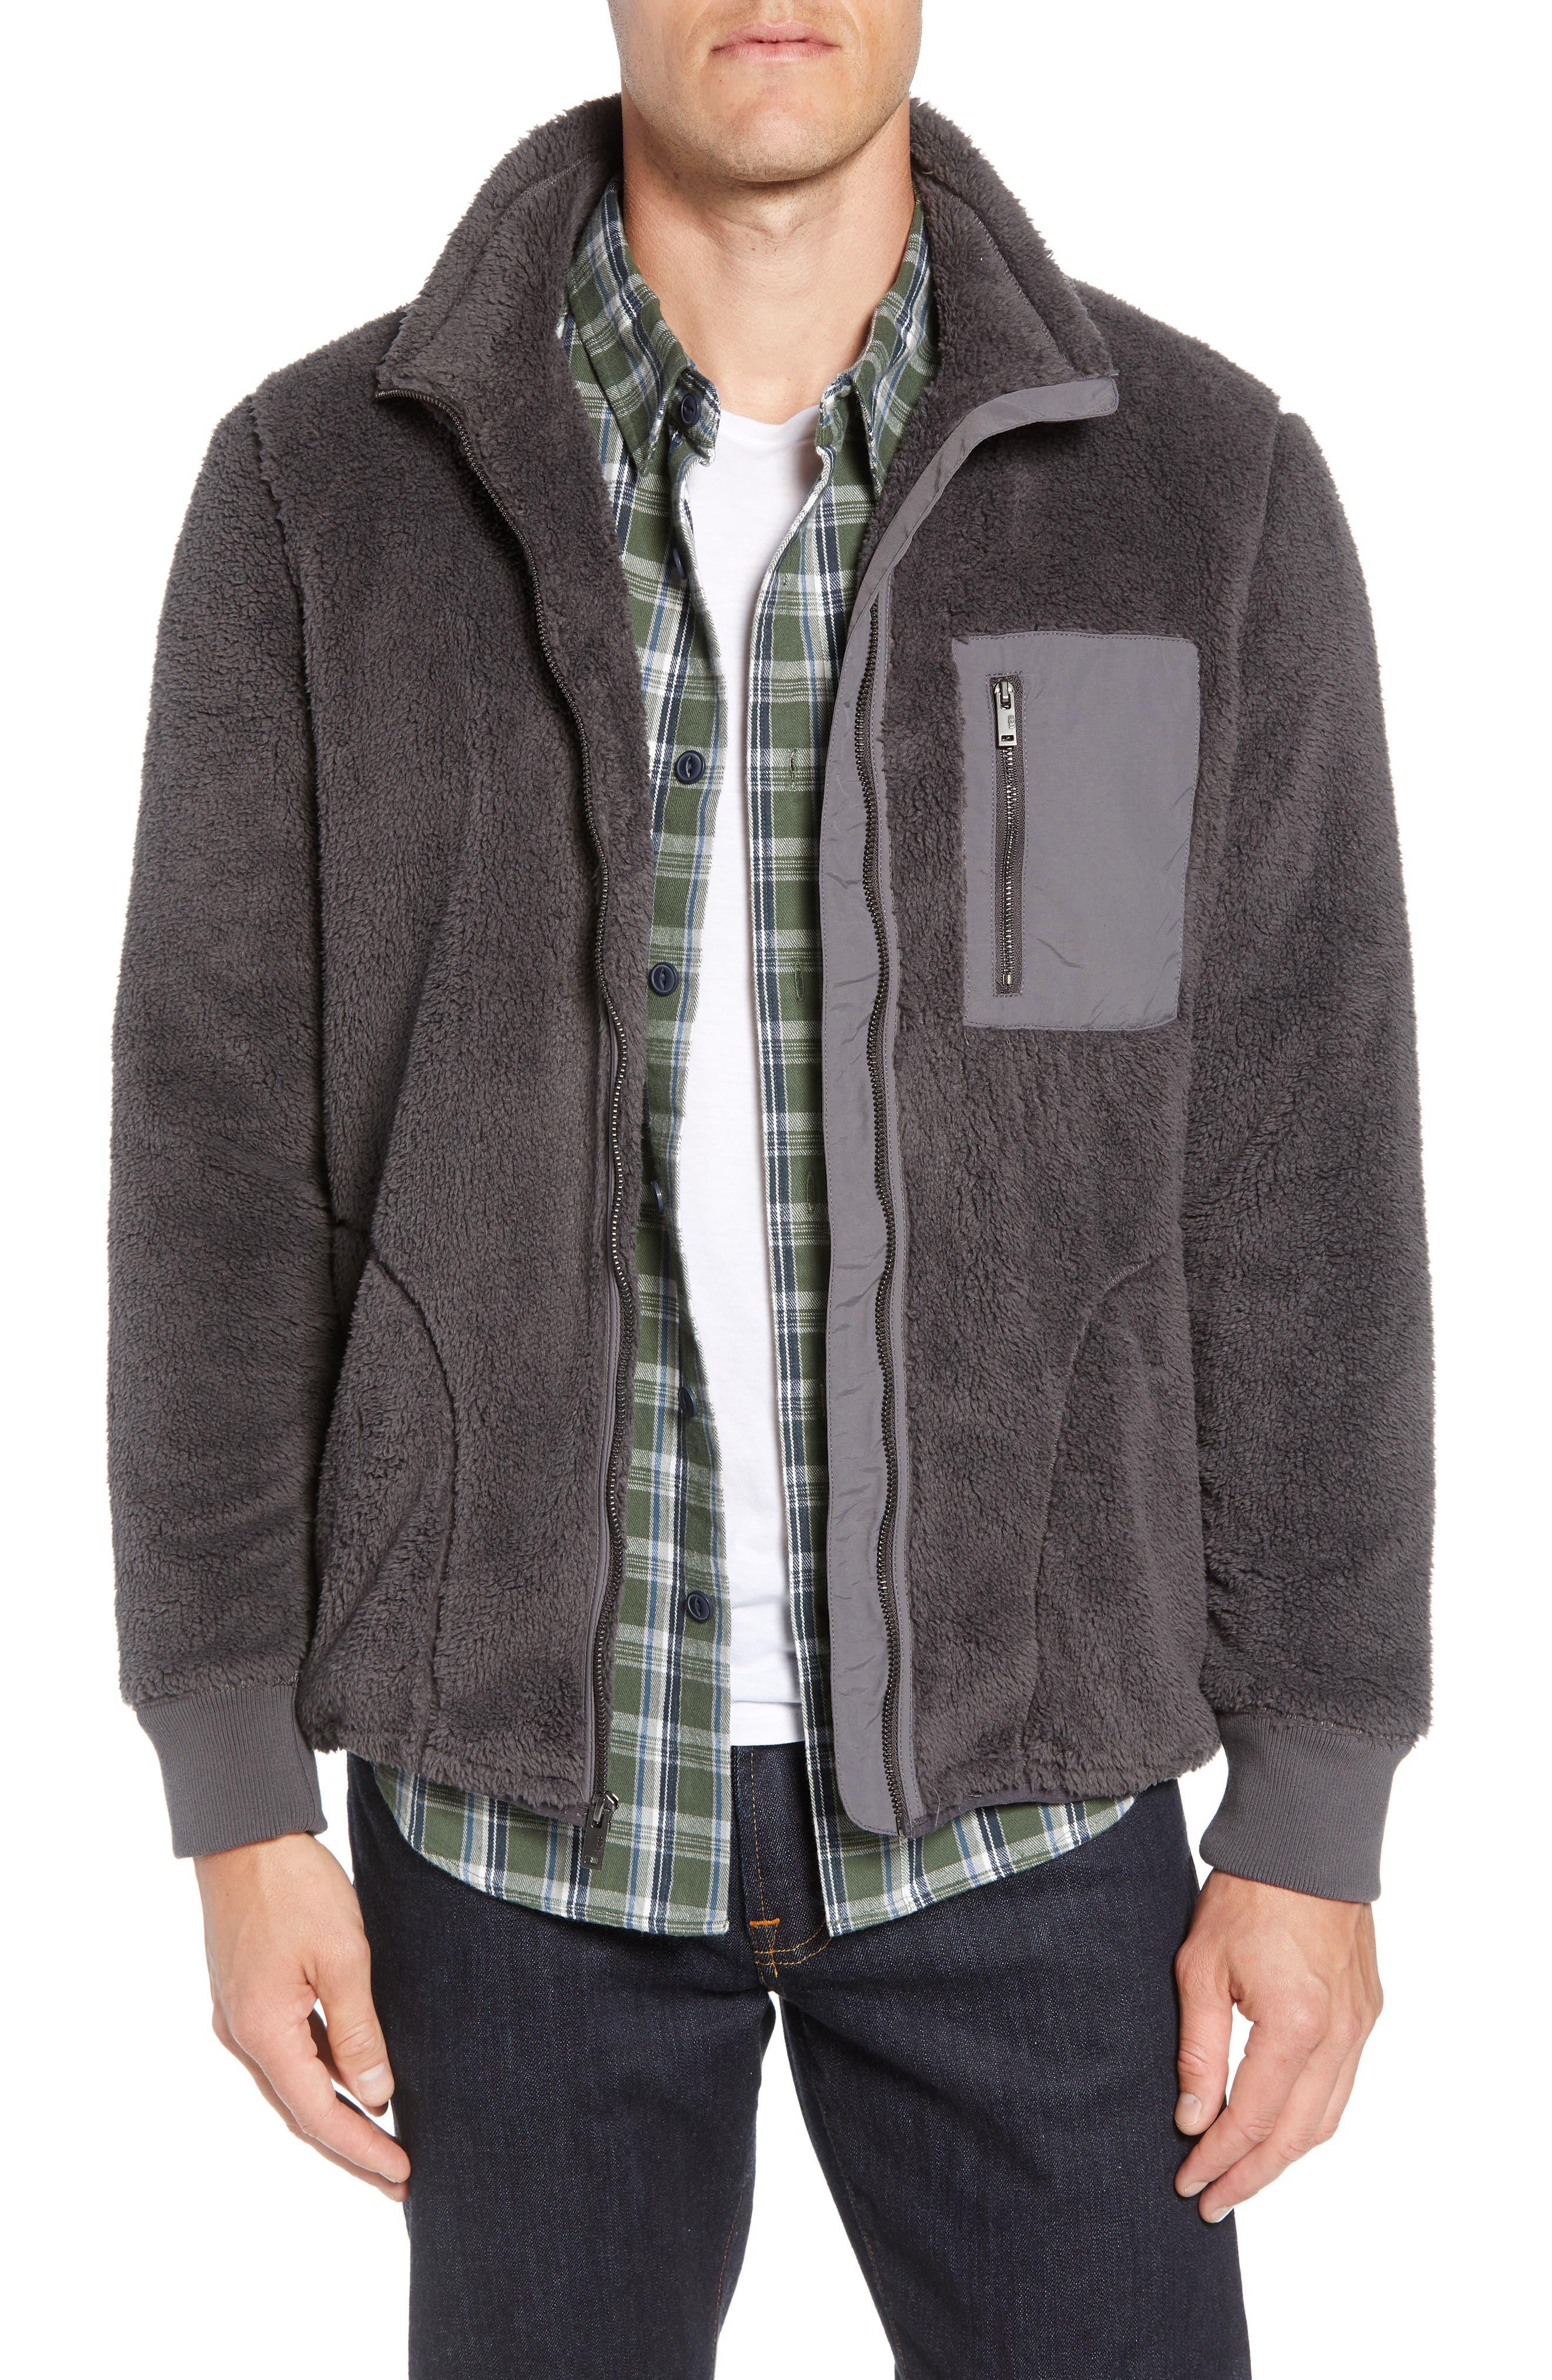 UGG<SUP>®</SUP> Lucas High Pile Fleece Sweater Jacket, Main, color, CHARCOAL